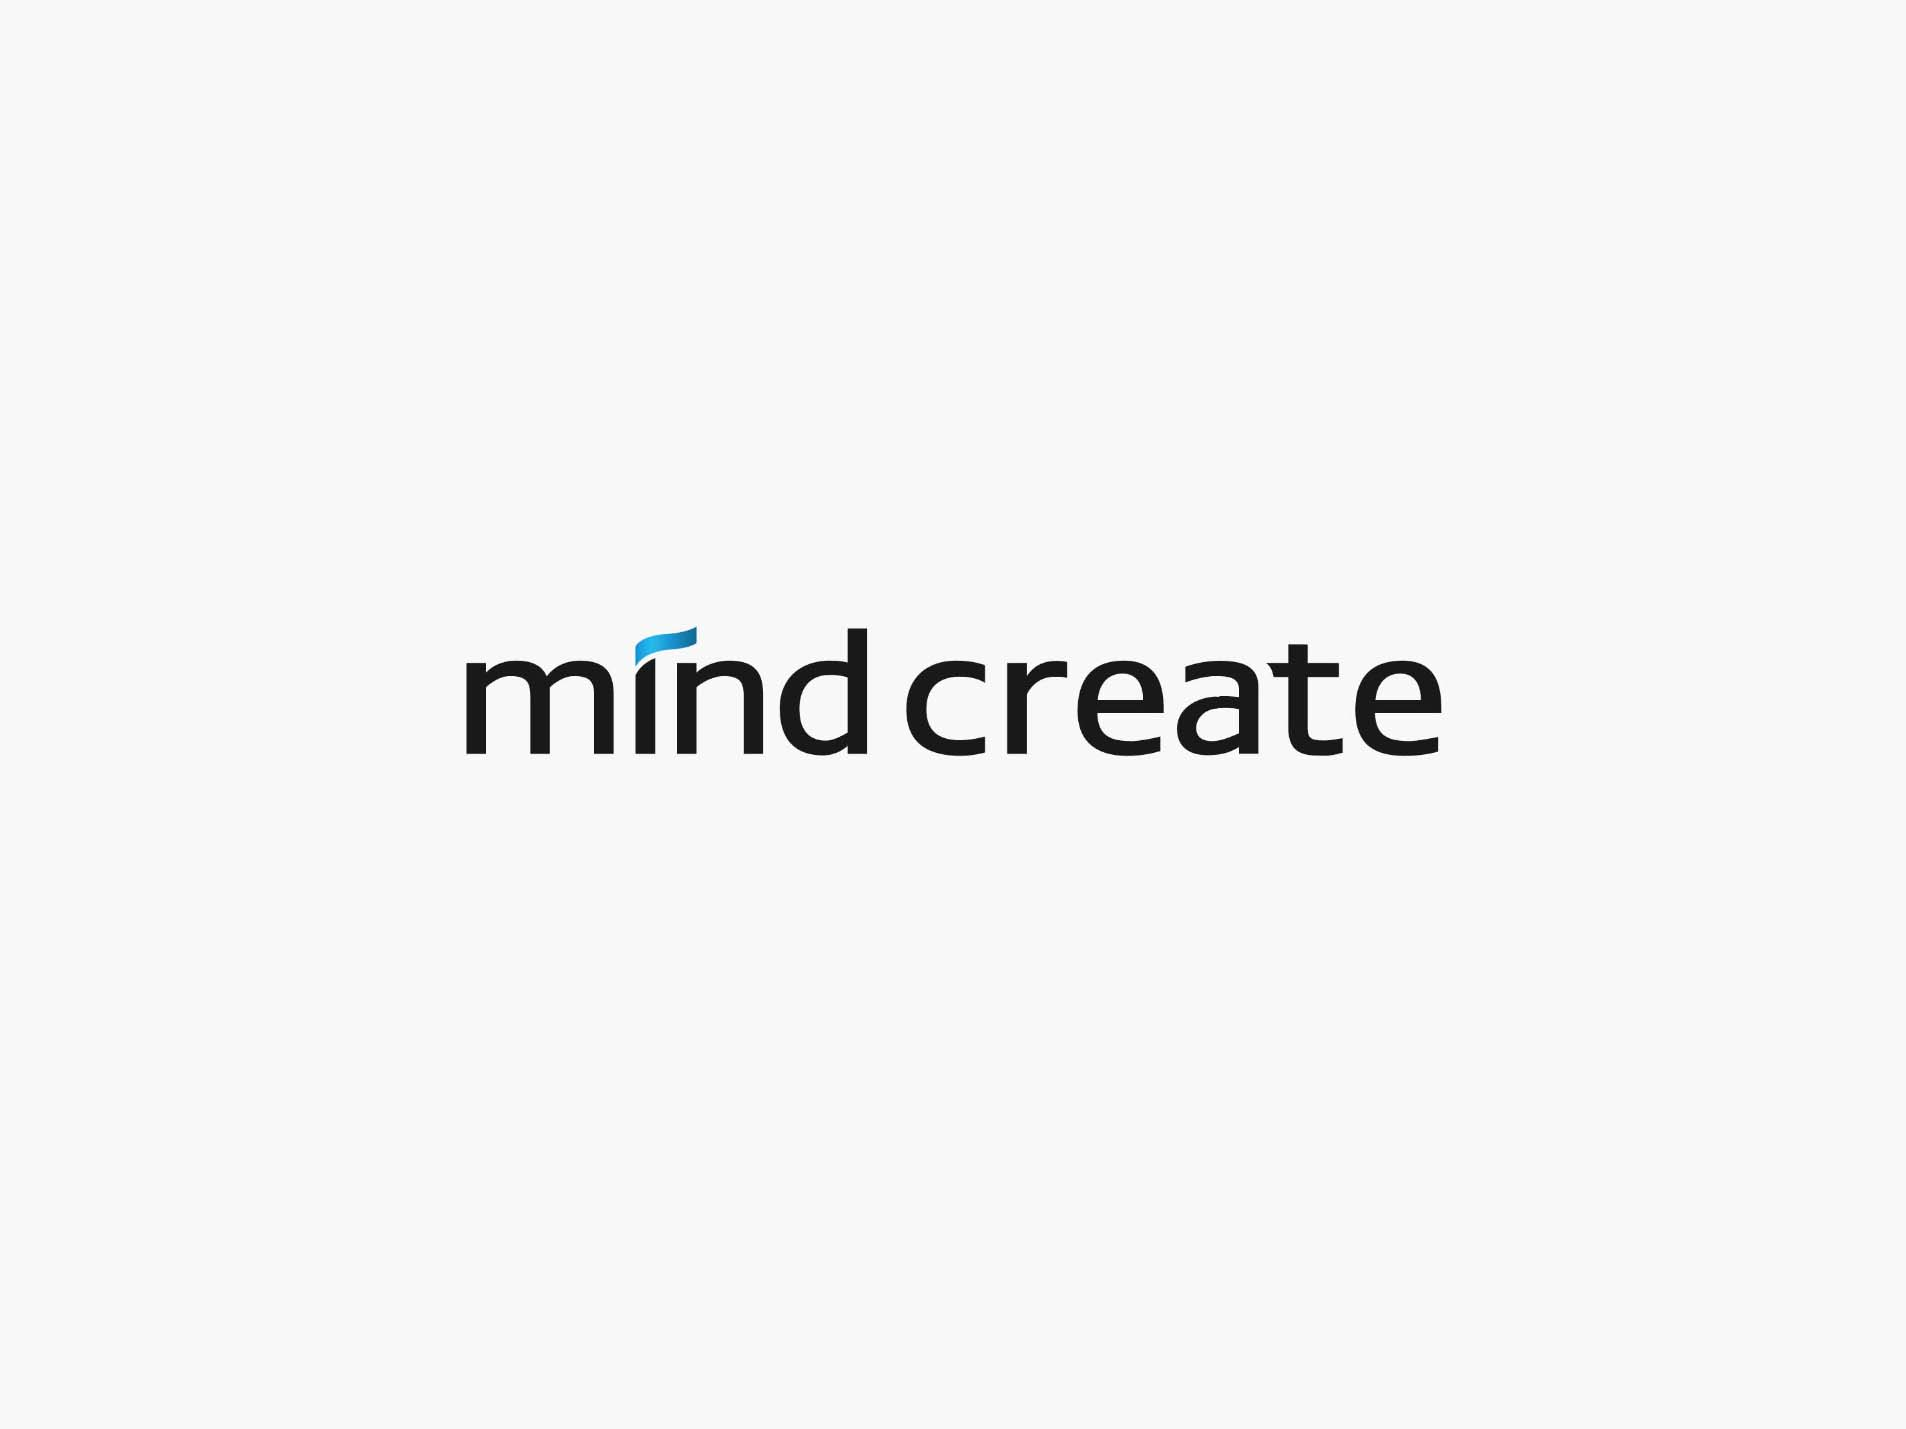 mindcreate branding